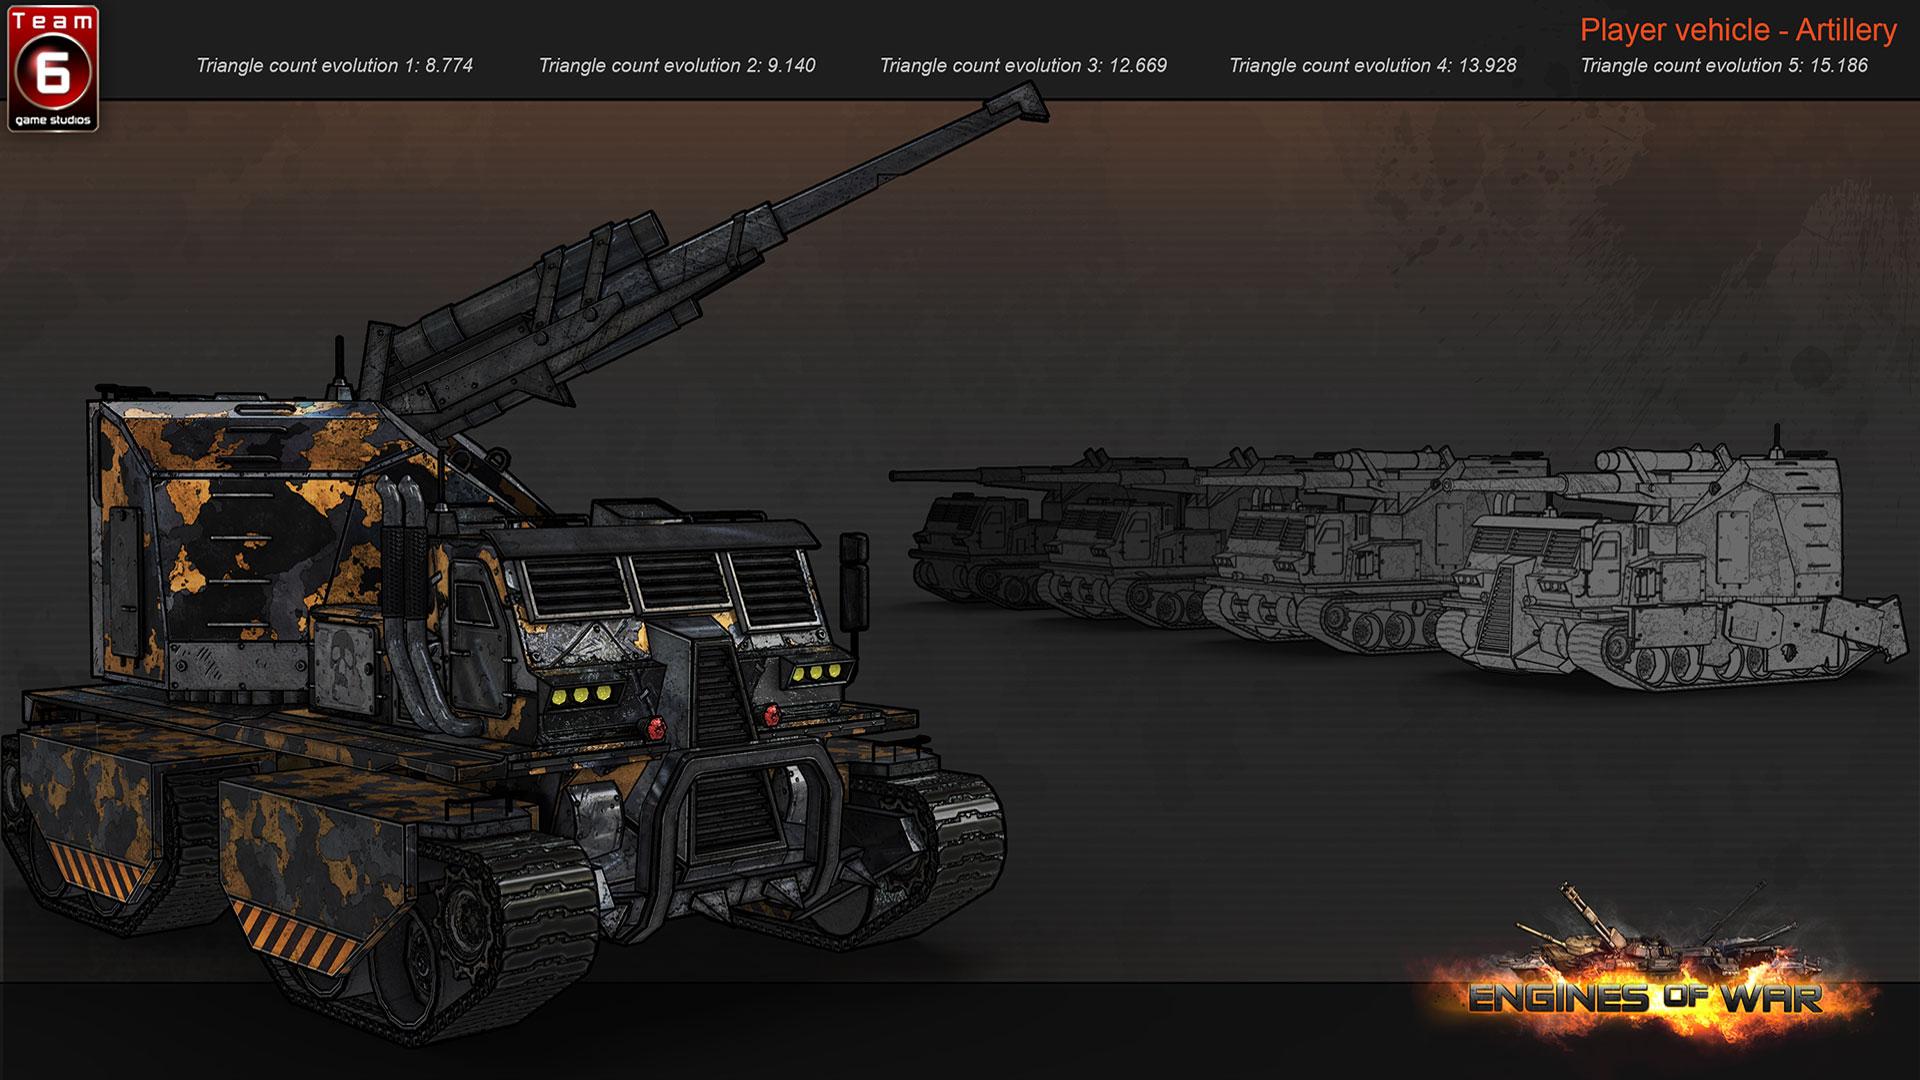 PlayerVehicle_Artillery_EnginesOfWar